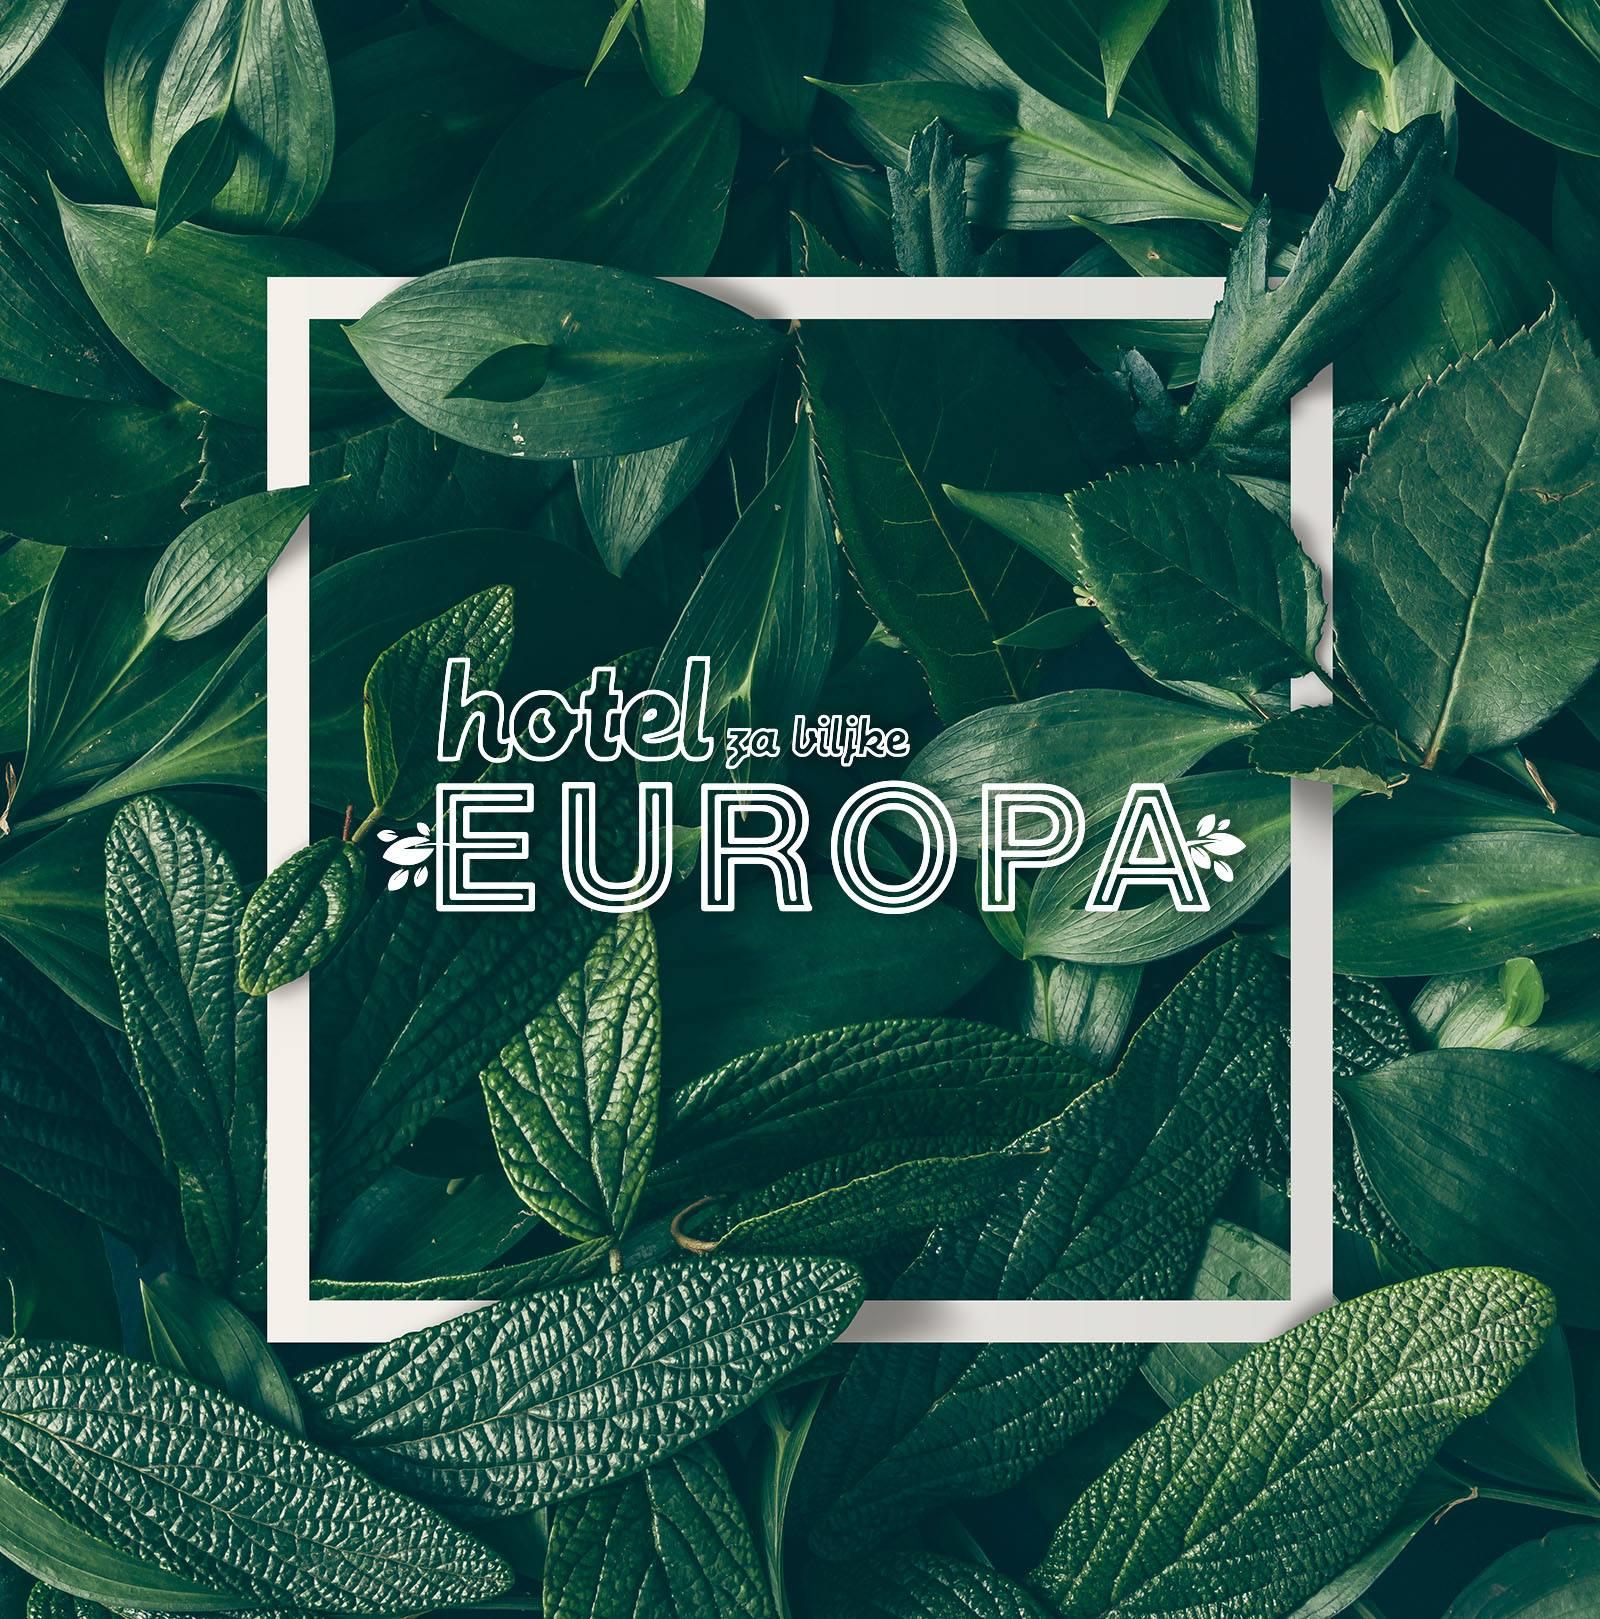 Prvi zagrebački hotel za biljke